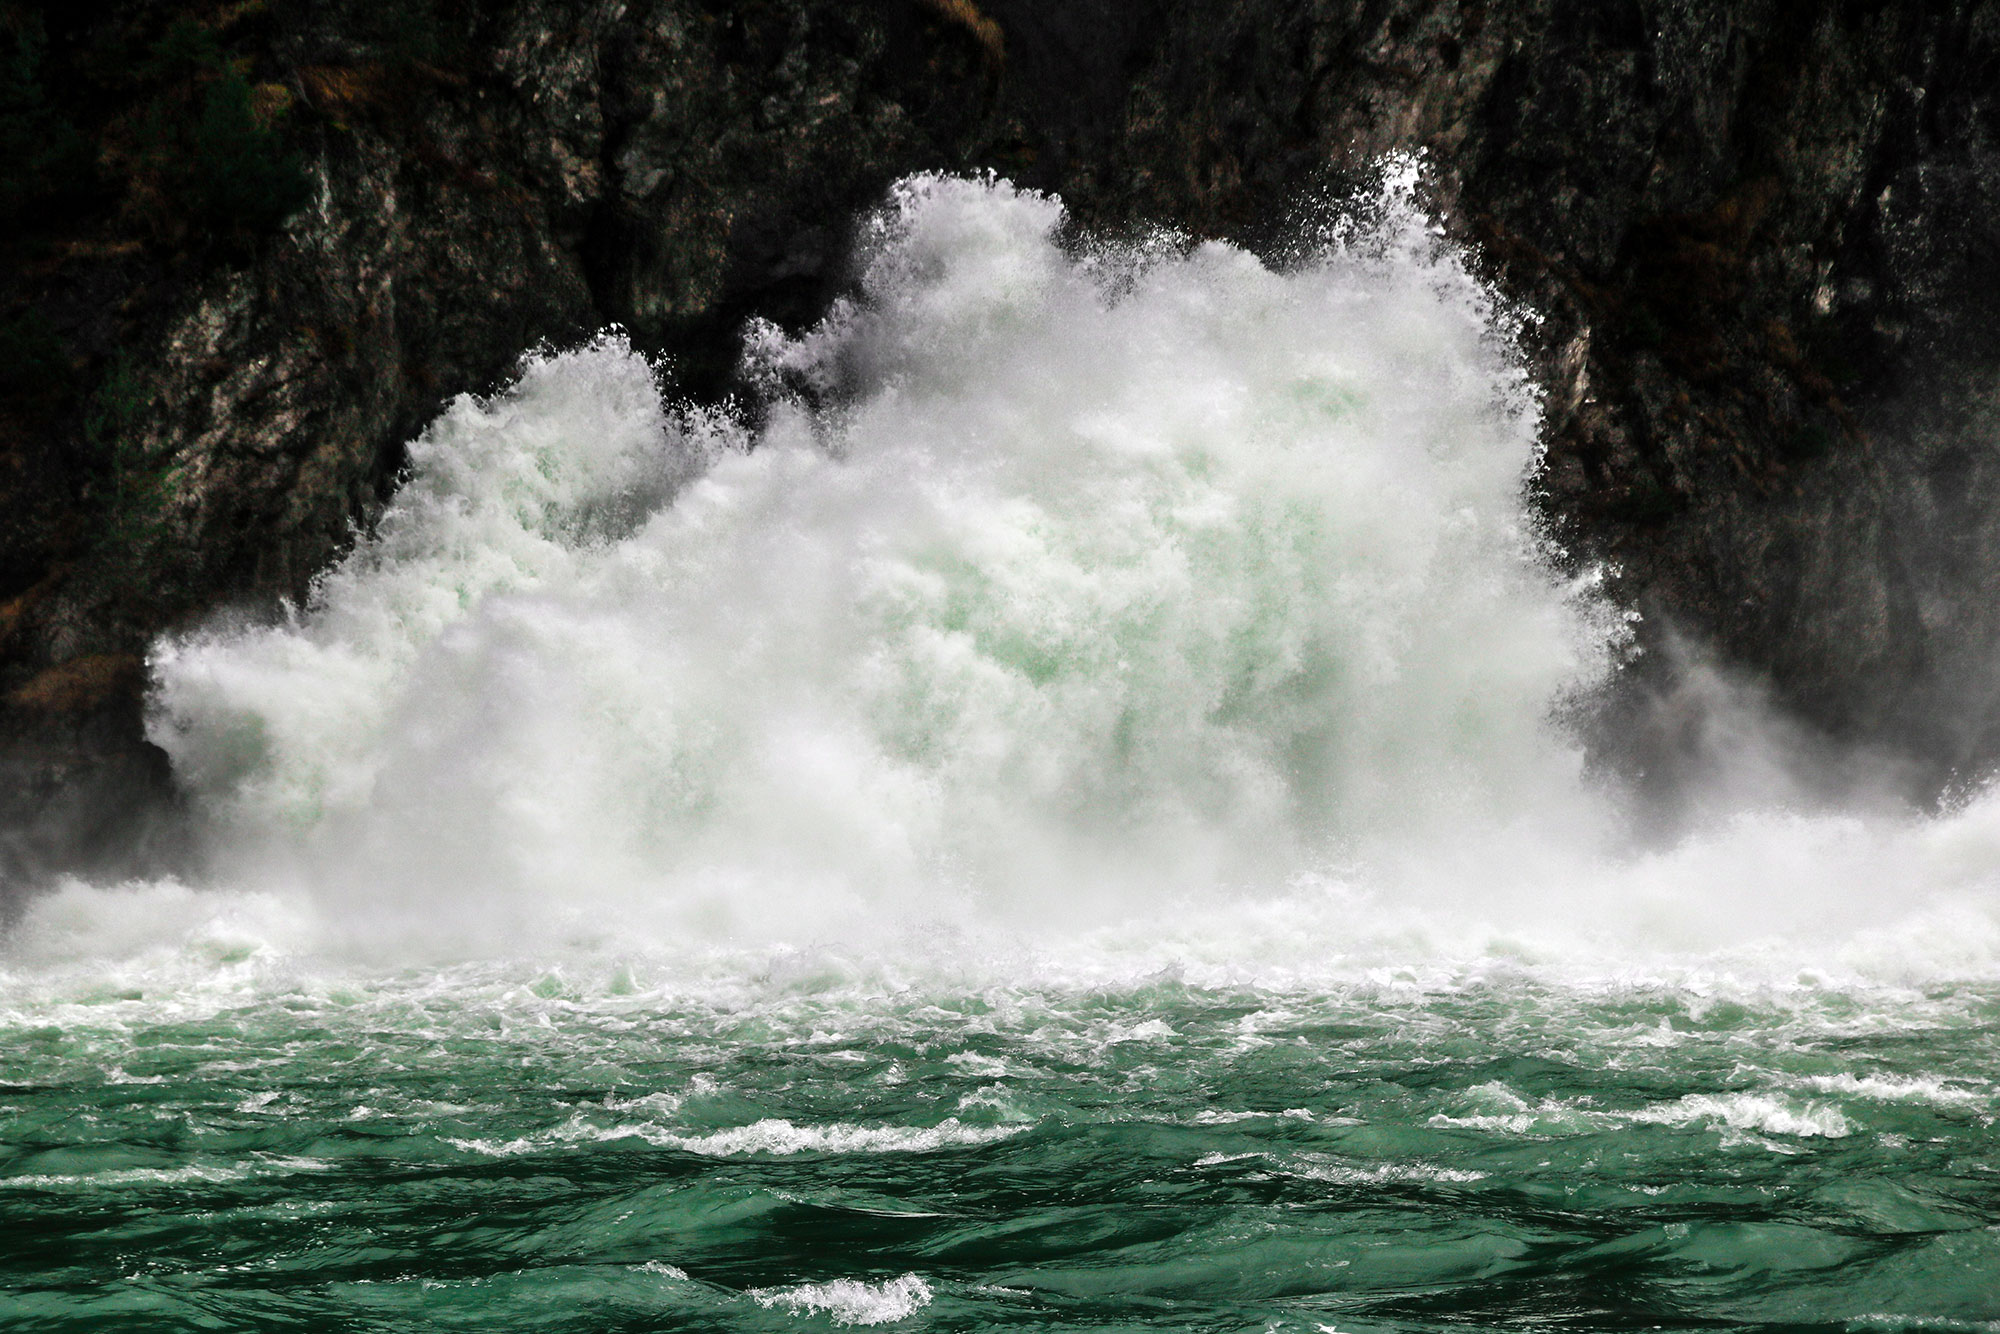 Isarwasserkraft